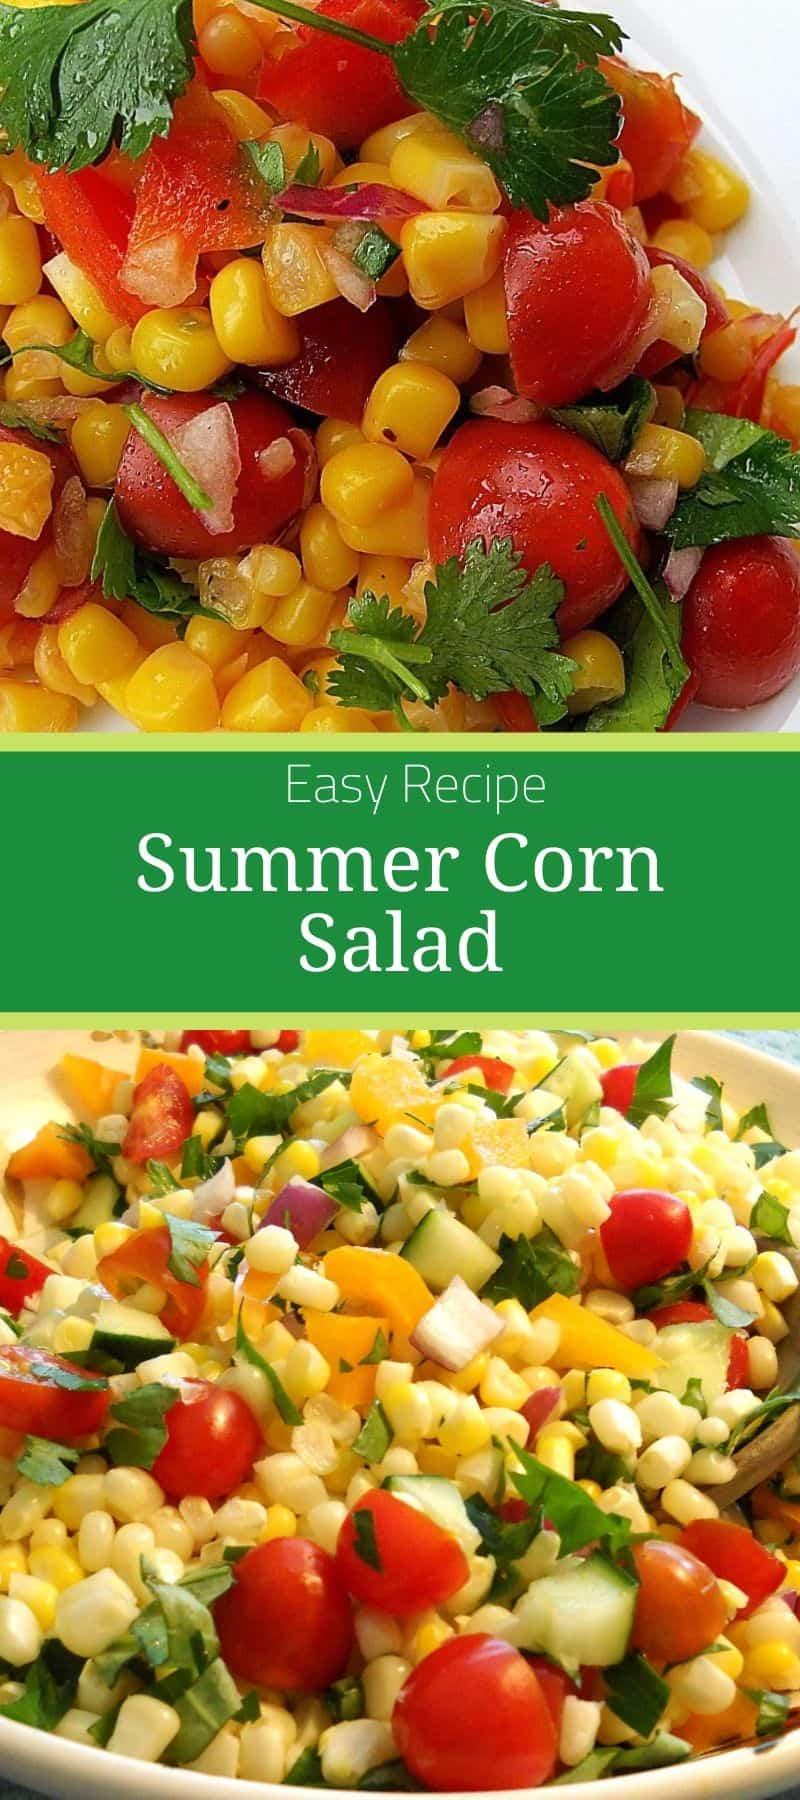 Summer Corn Salad Recipe 3